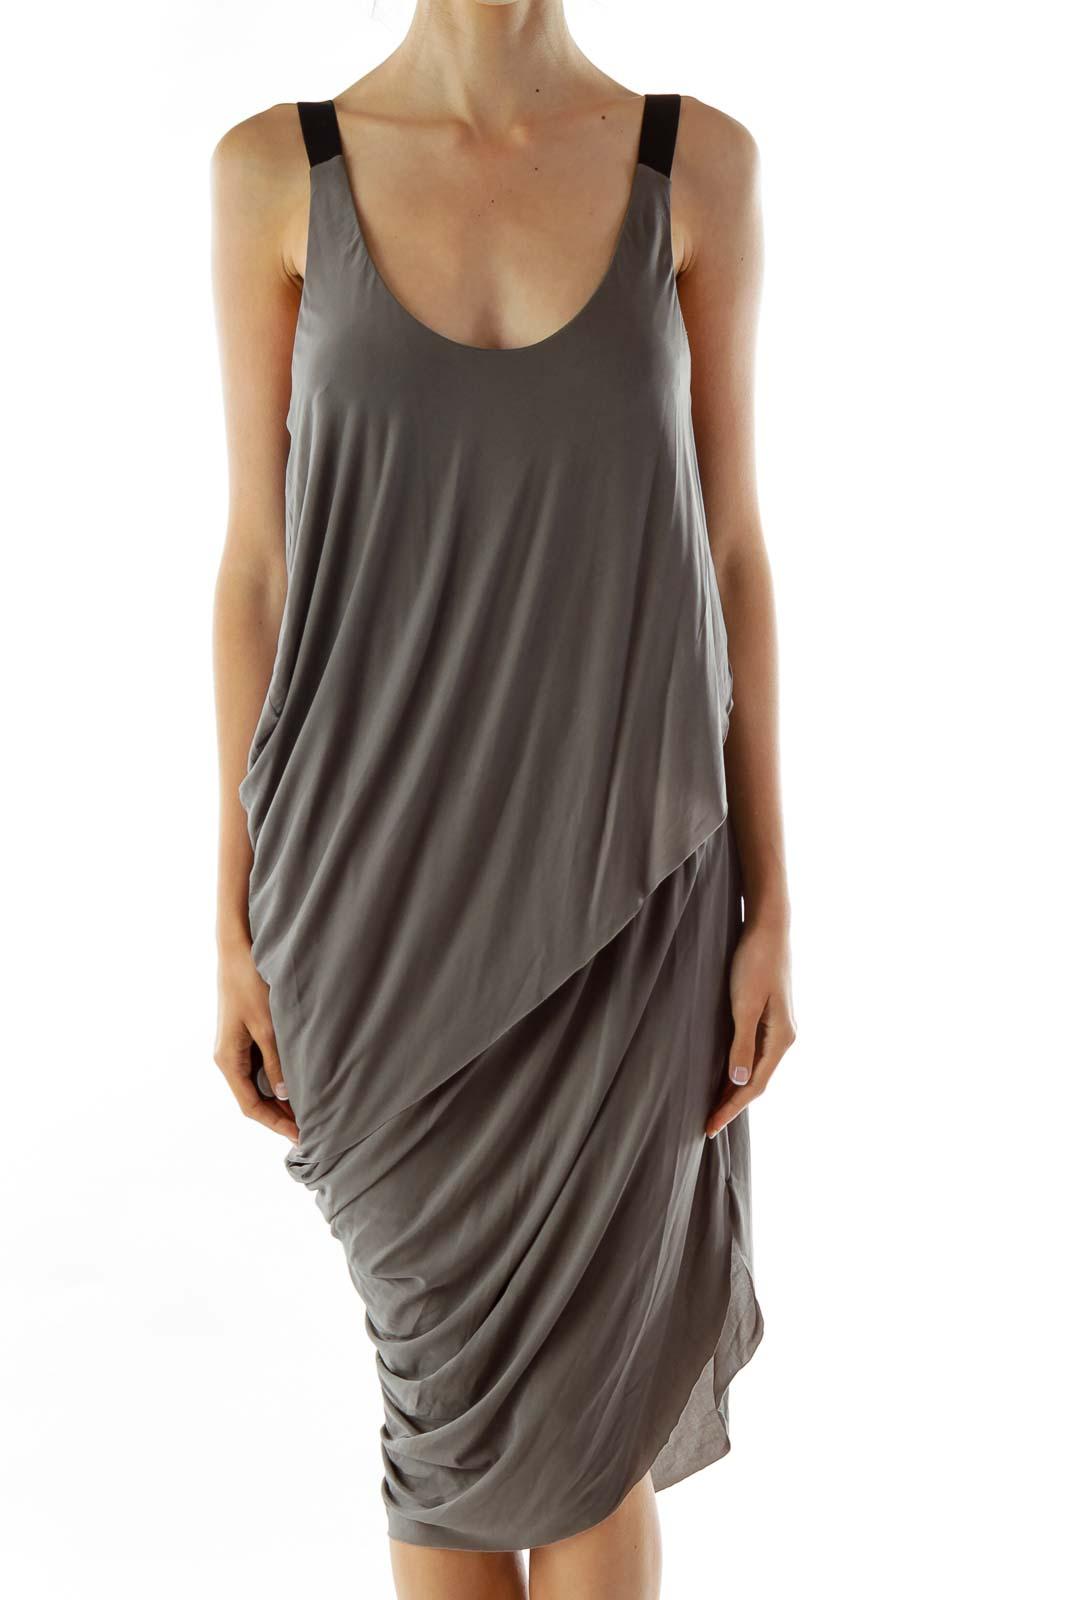 Green Sleeveless Day Dress